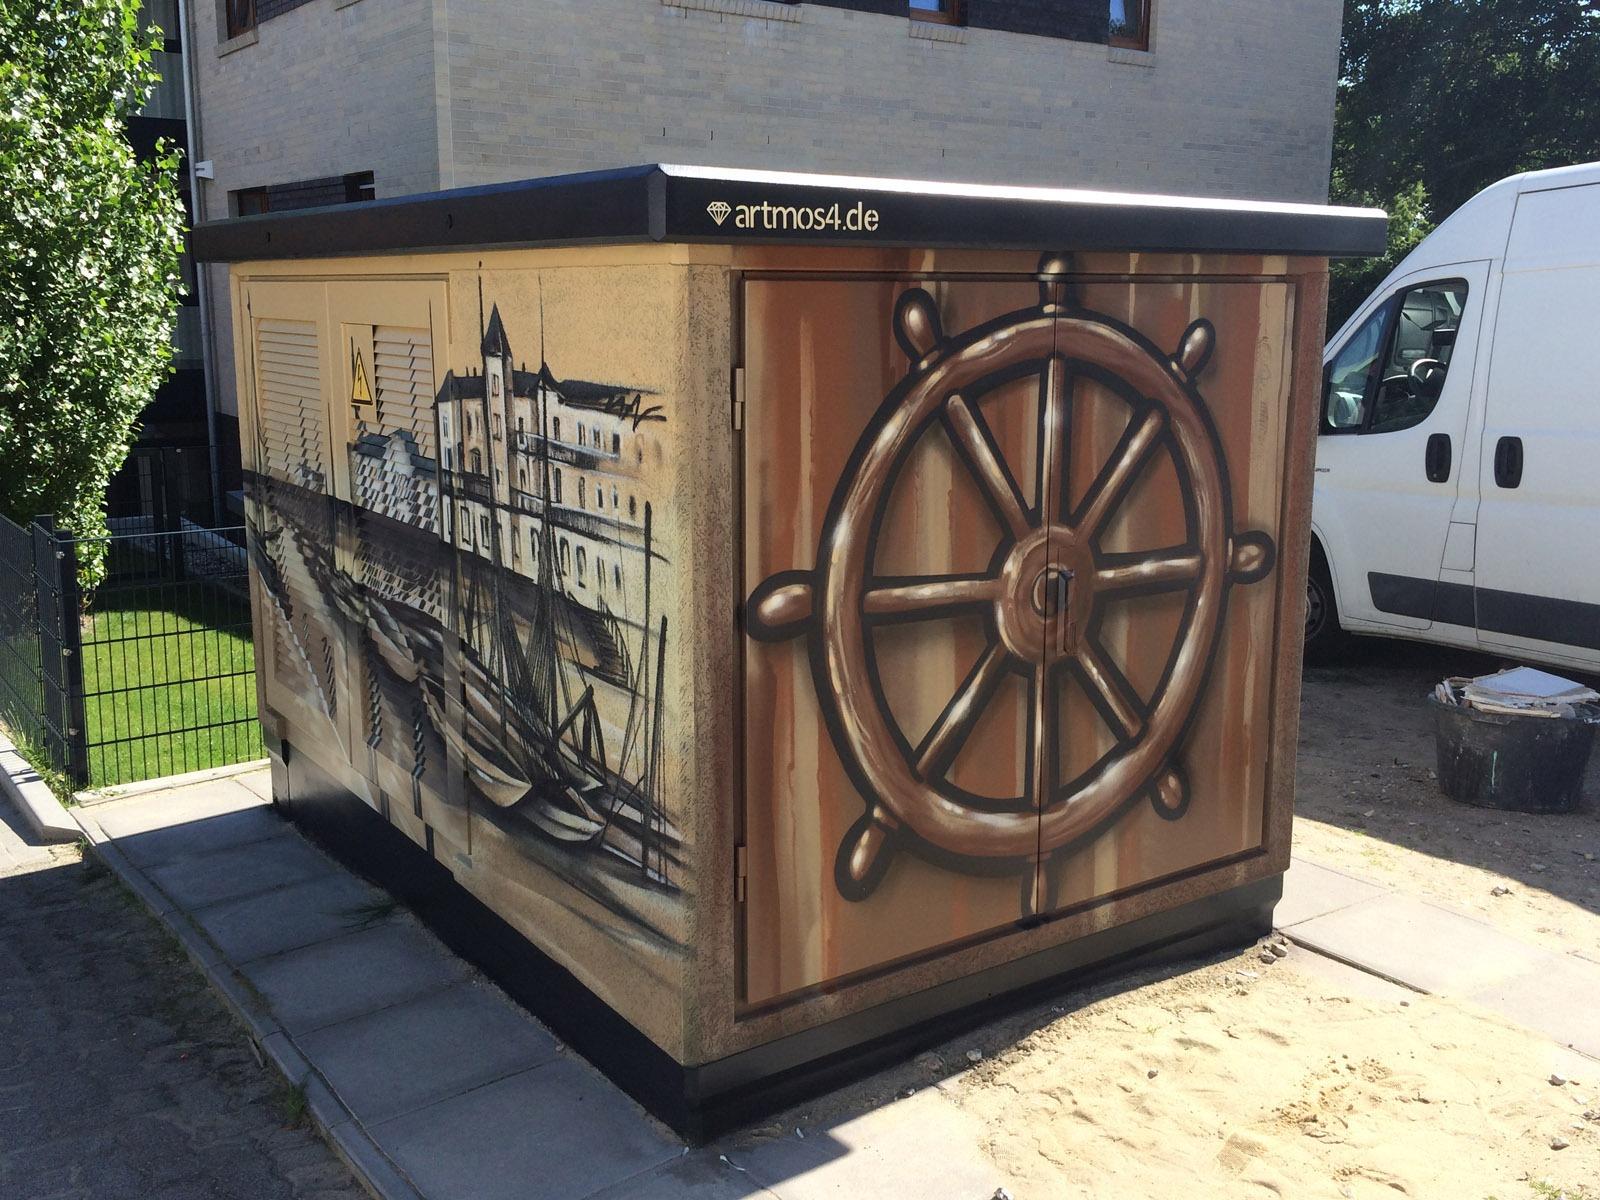 graffitiauftrag-graffitikuenstler-artmos4-hansewerk-2016-landschaft-holz-braun-beige-fotorealistisch-aussen-energieversorger